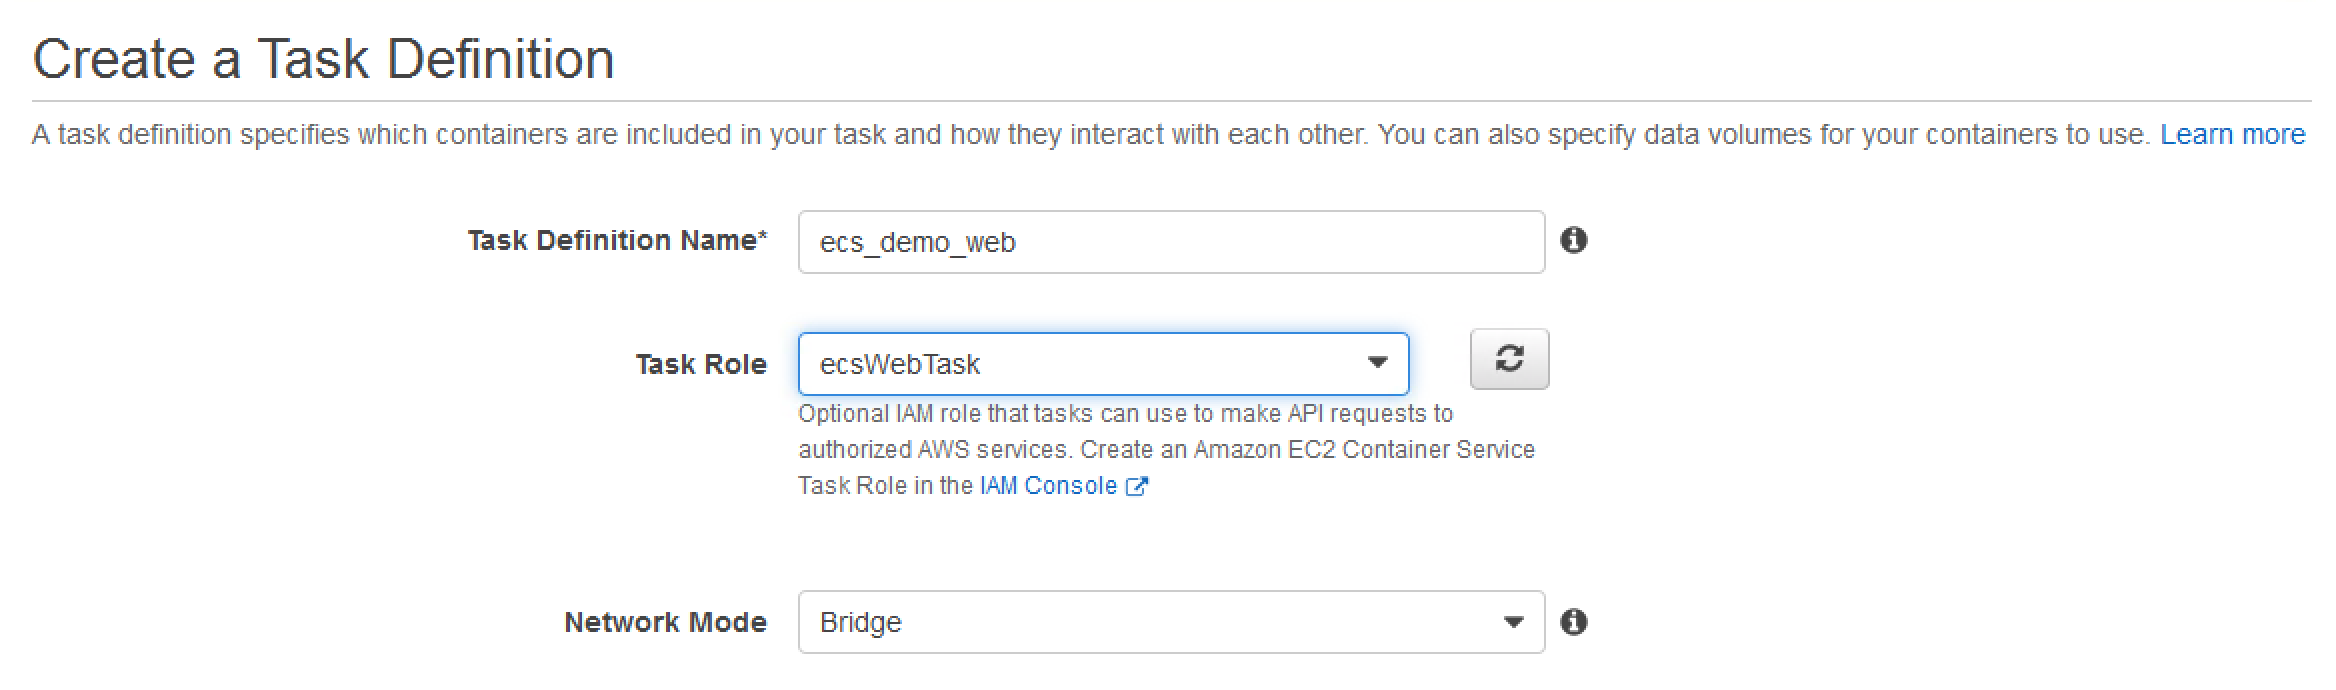 create task def